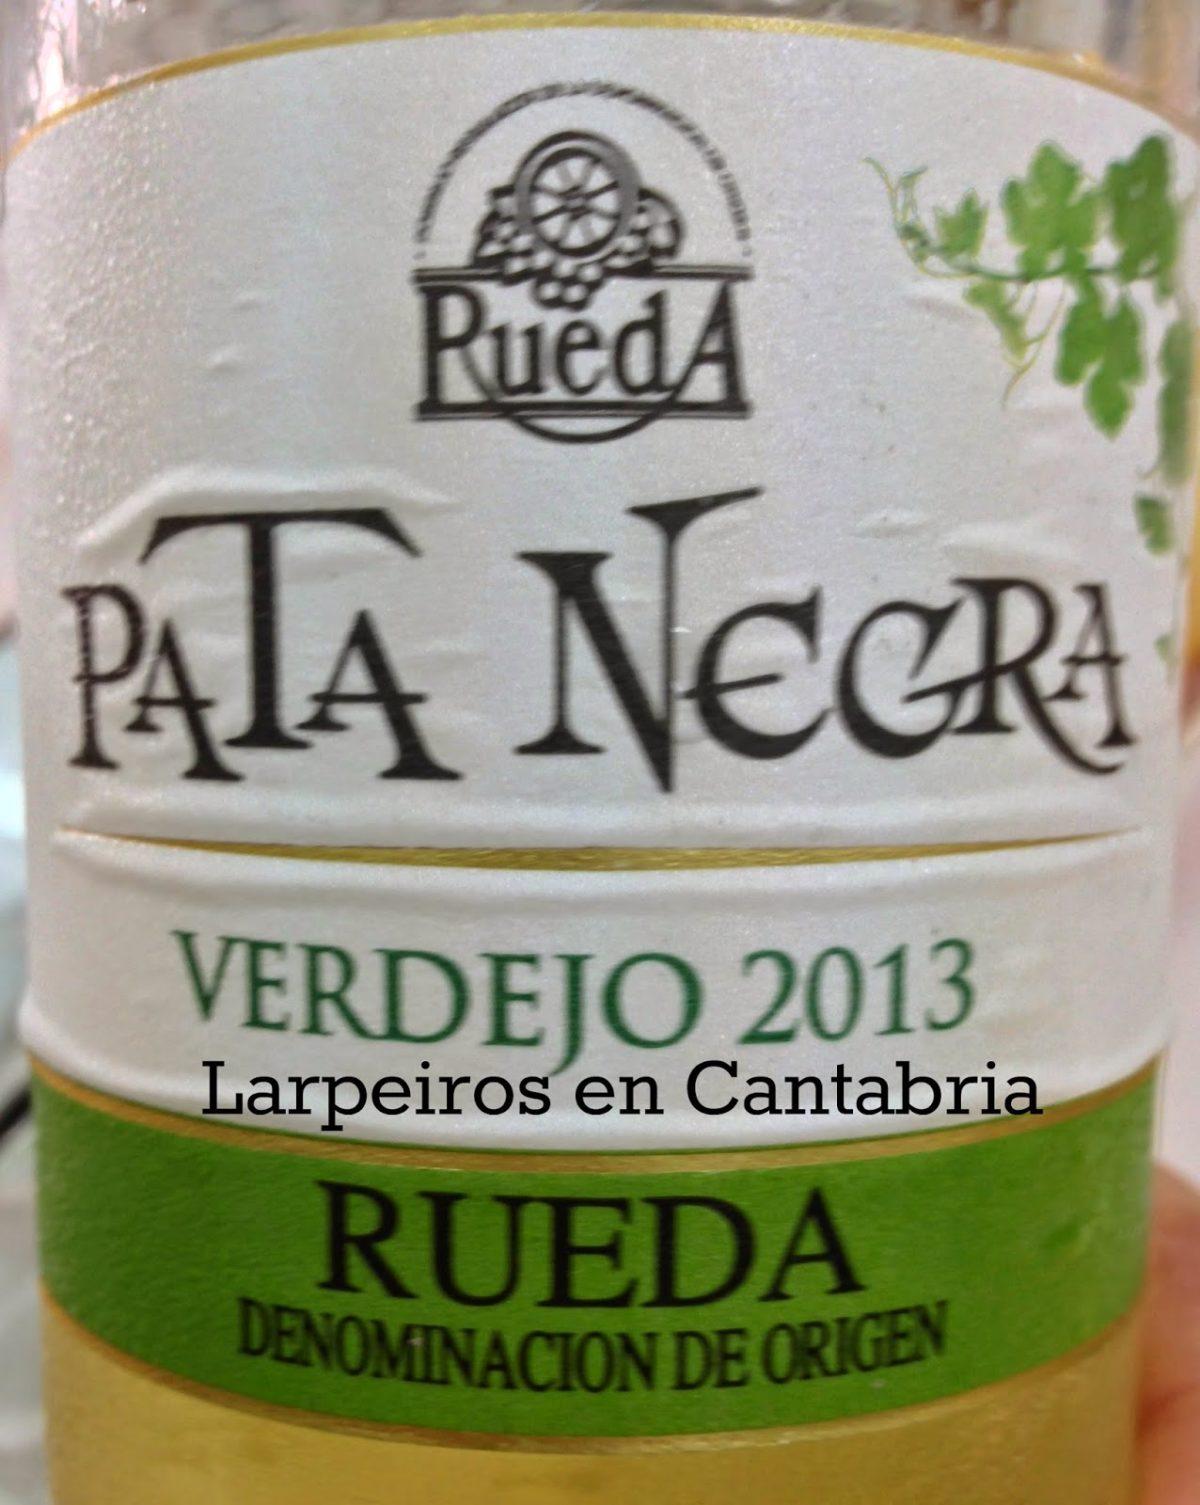 Vino Blanco Pata Negra 2013 Verdejo: Pues …